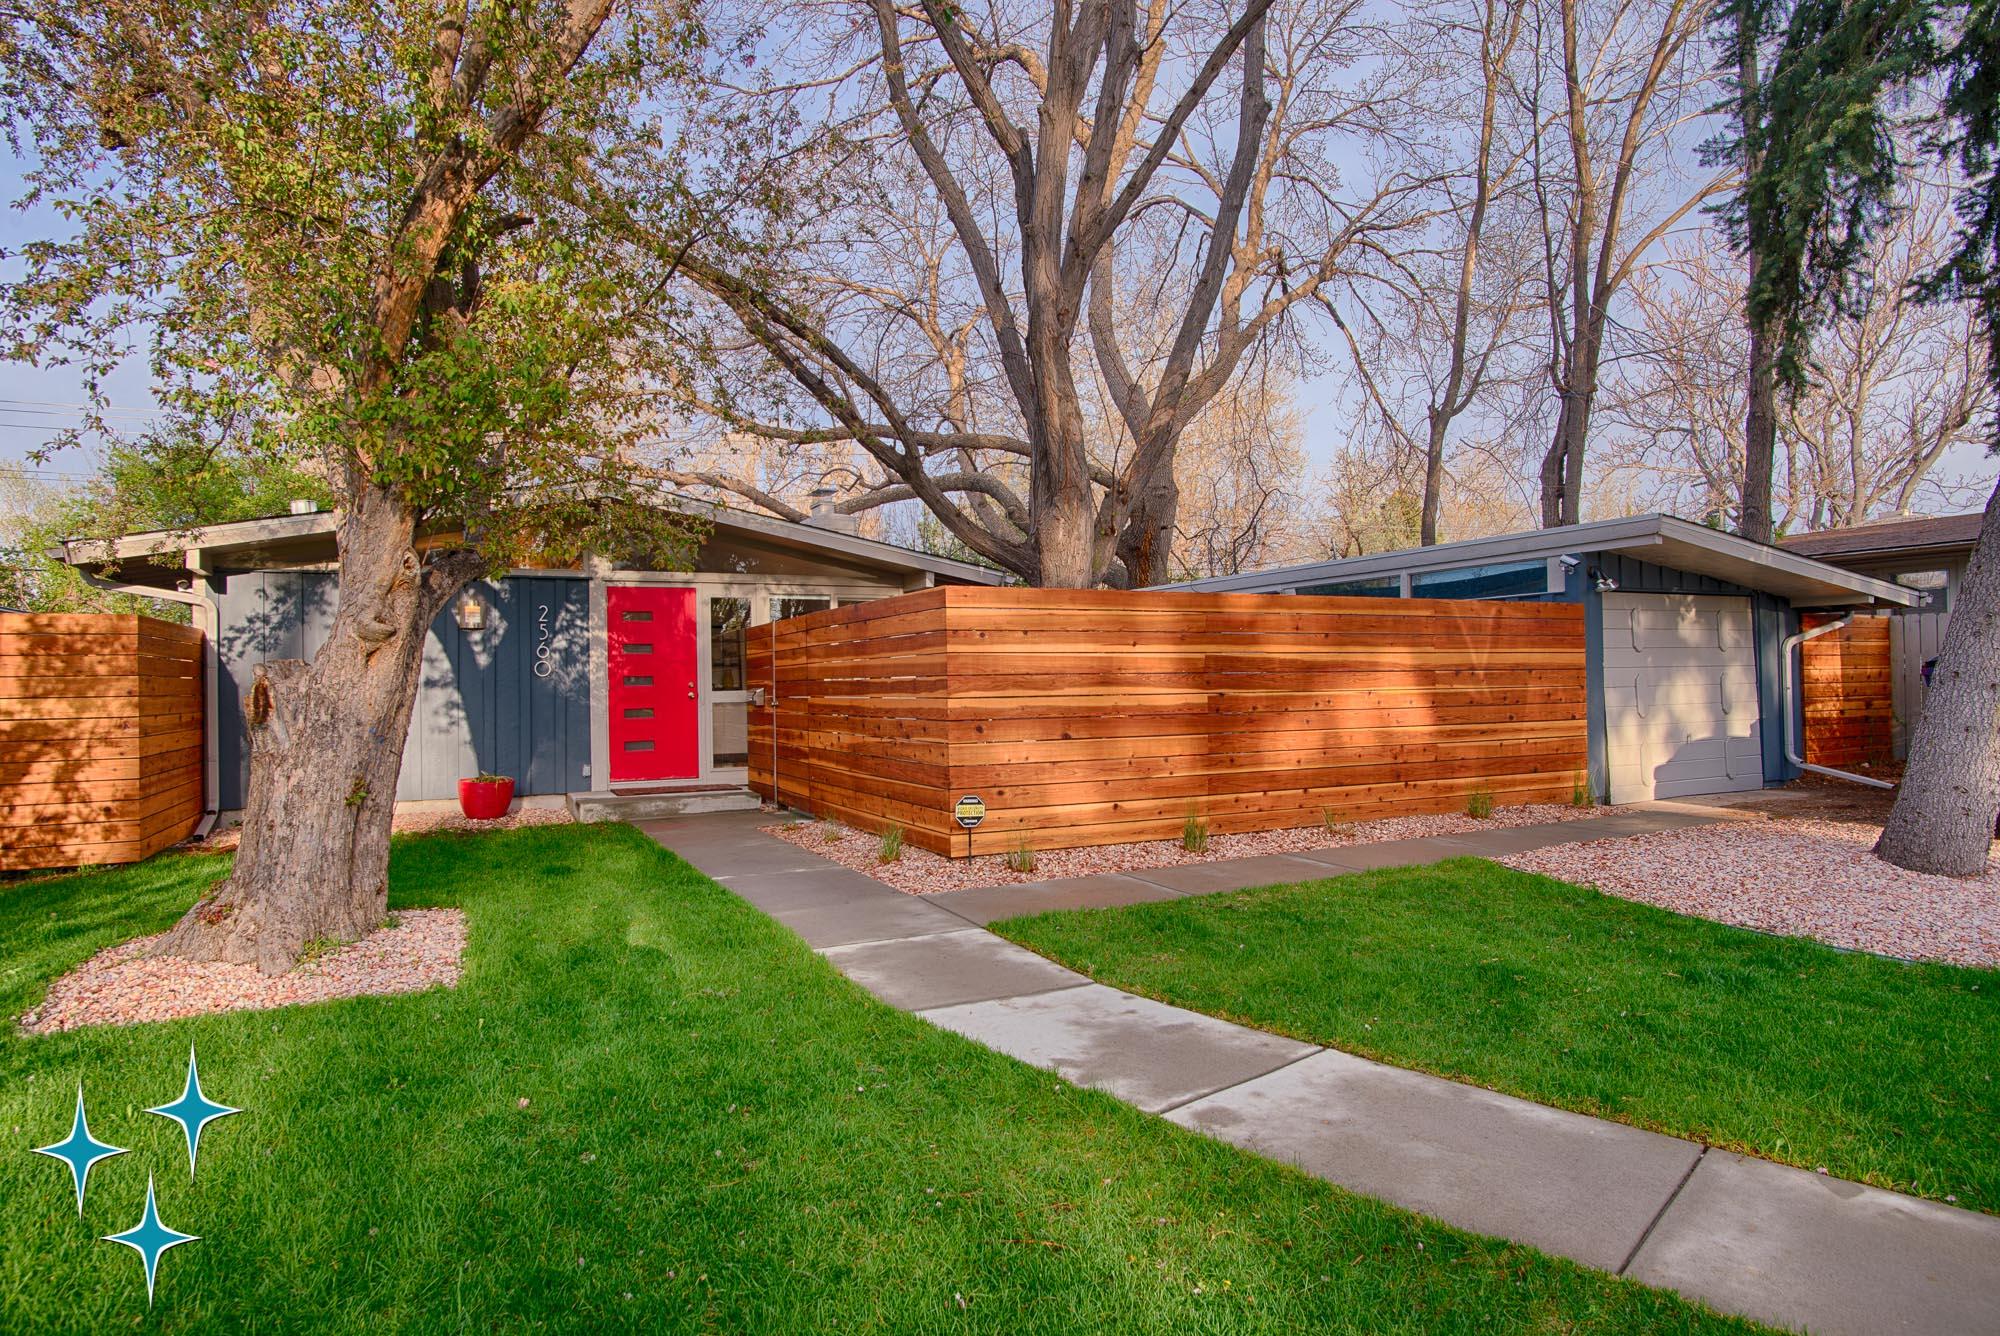 Adrian-Kinney-2560-S-Newton-Street-Denver-Cliff-May-Harvey-Park-2000w50-3SWM-1.jpg